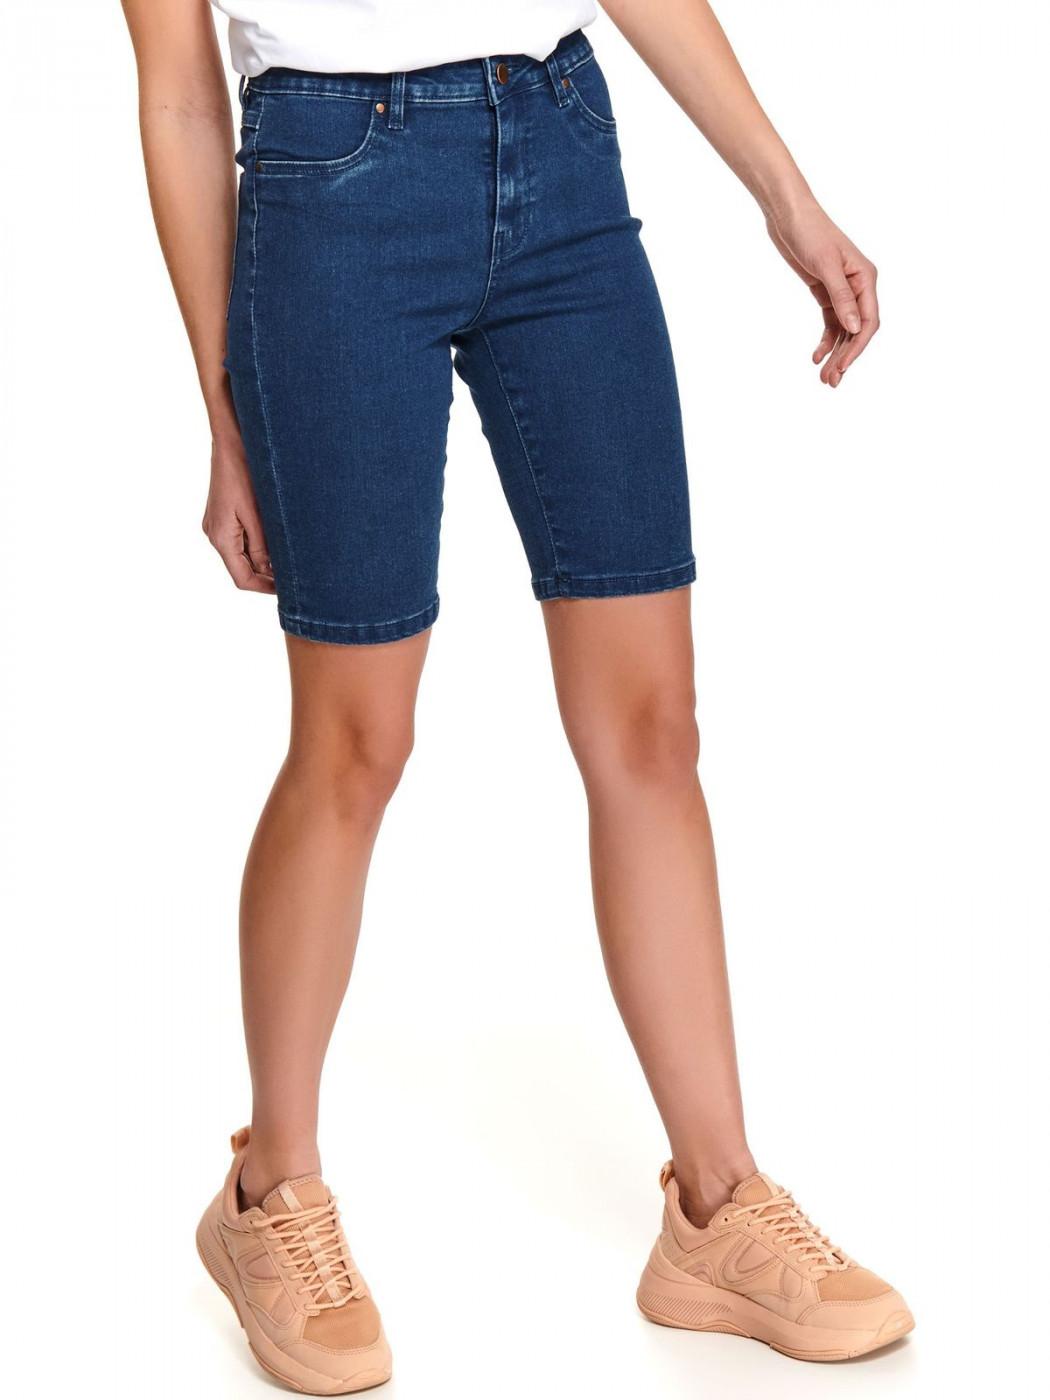 Women's shorts Drywash Denim